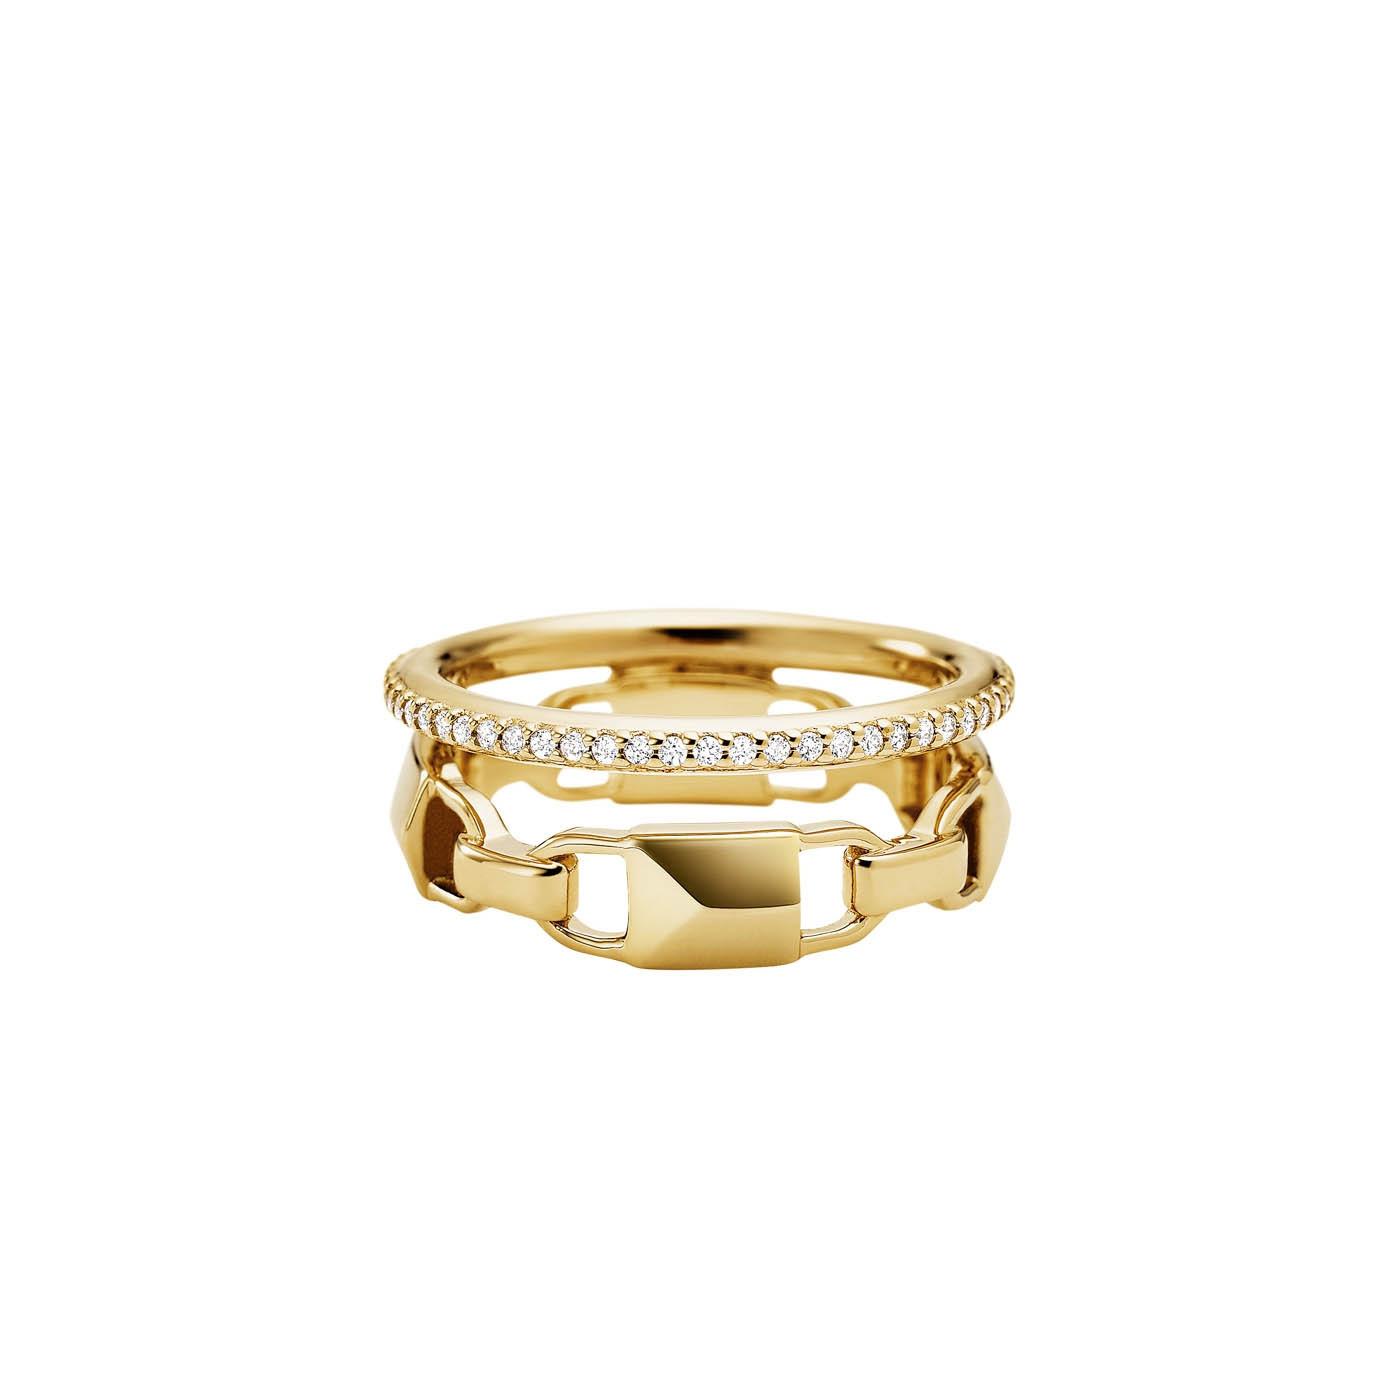 Michael Kors Zilveren Goudkleurige Mercer Link Ring MKC1025AN710